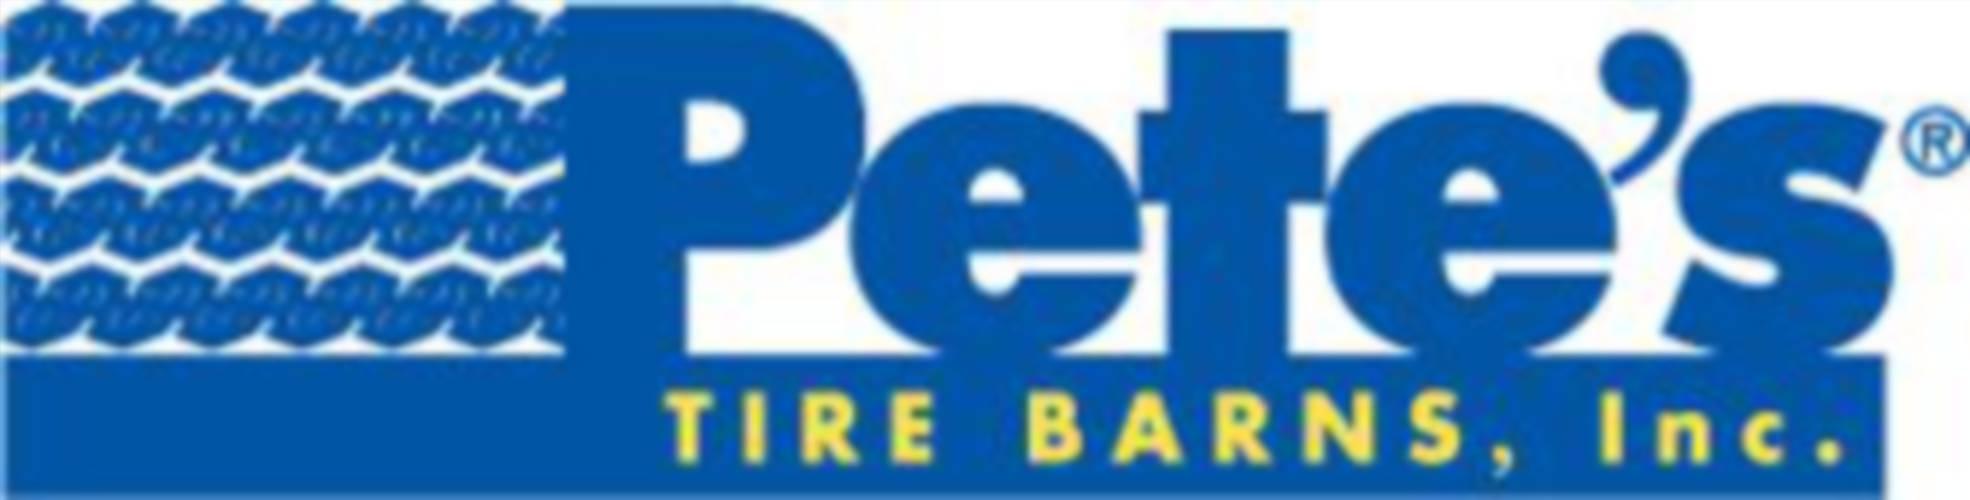 The Recorder Pete S Tire Barn Pledges 75 000 To Quabbin Retreat